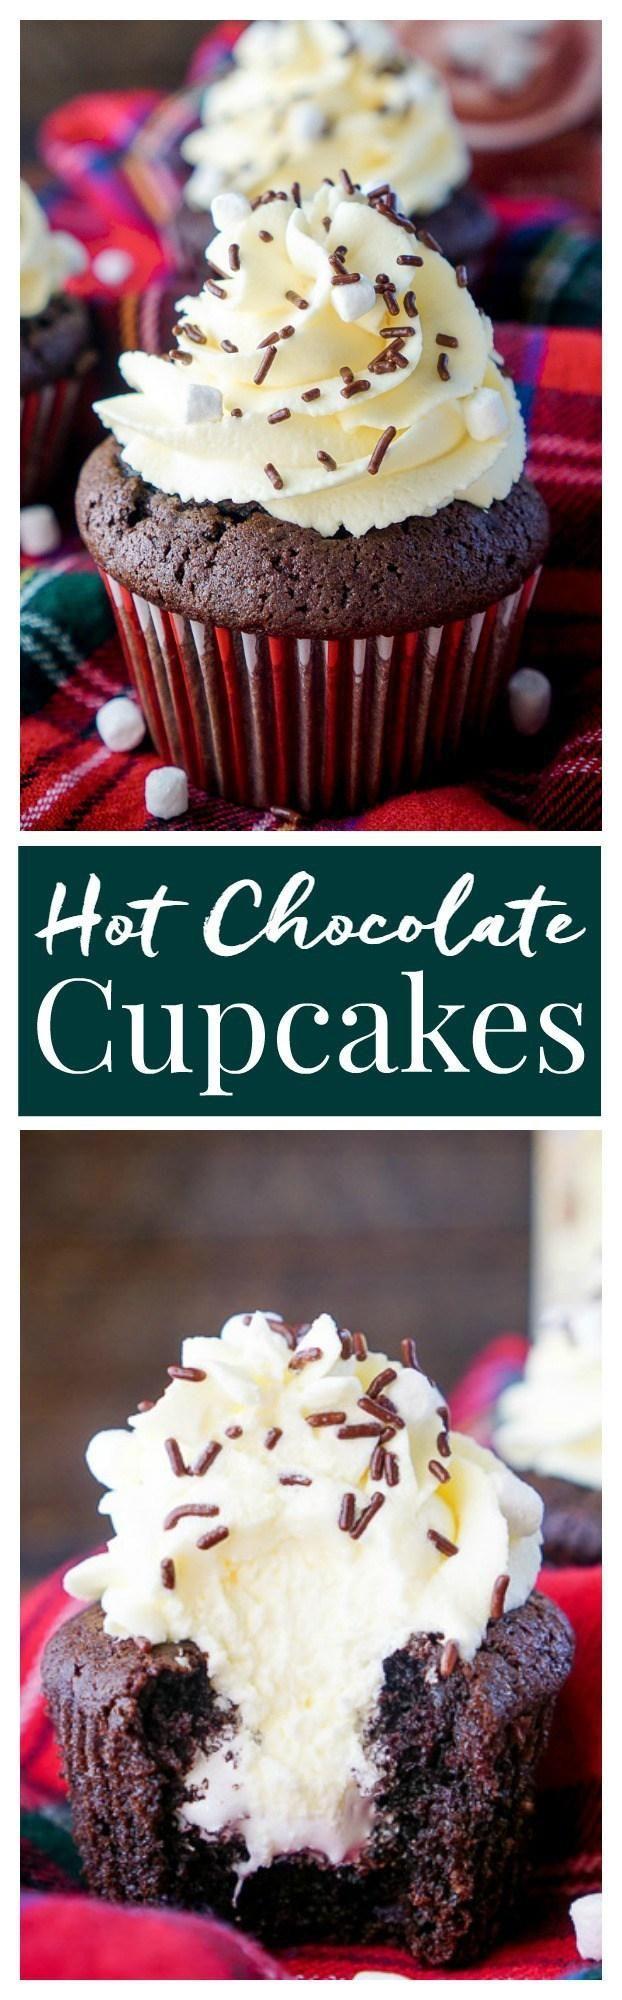 Pocket: Hot Chocolate Cupcakes